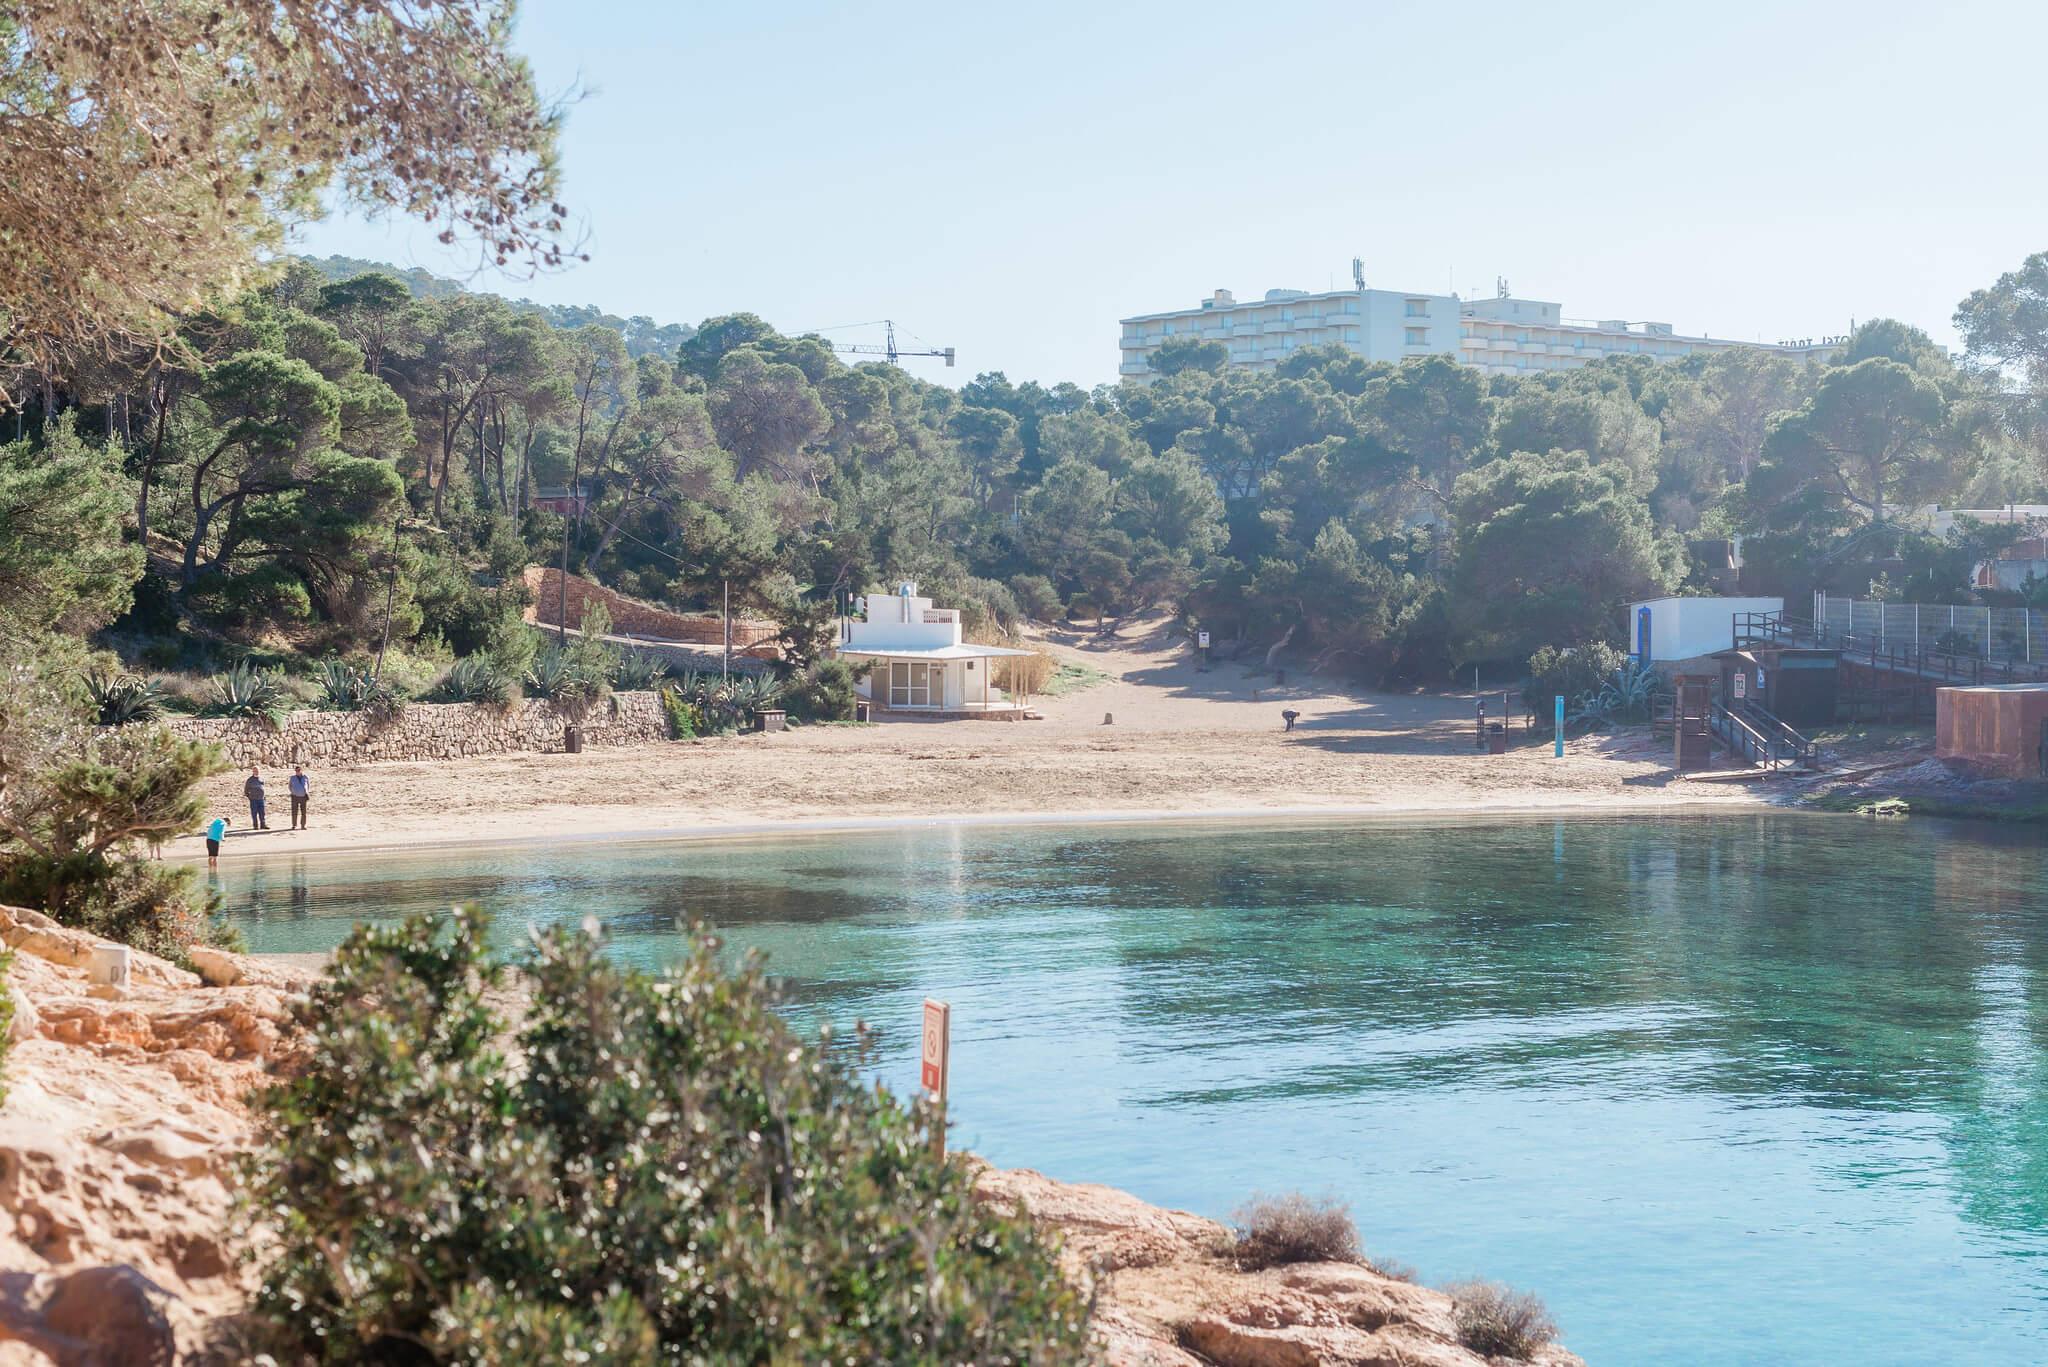 https://www.white-ibiza.com/wp-content/uploads/2020/03/ibiza-beaches-cala-gracio-01.jpg